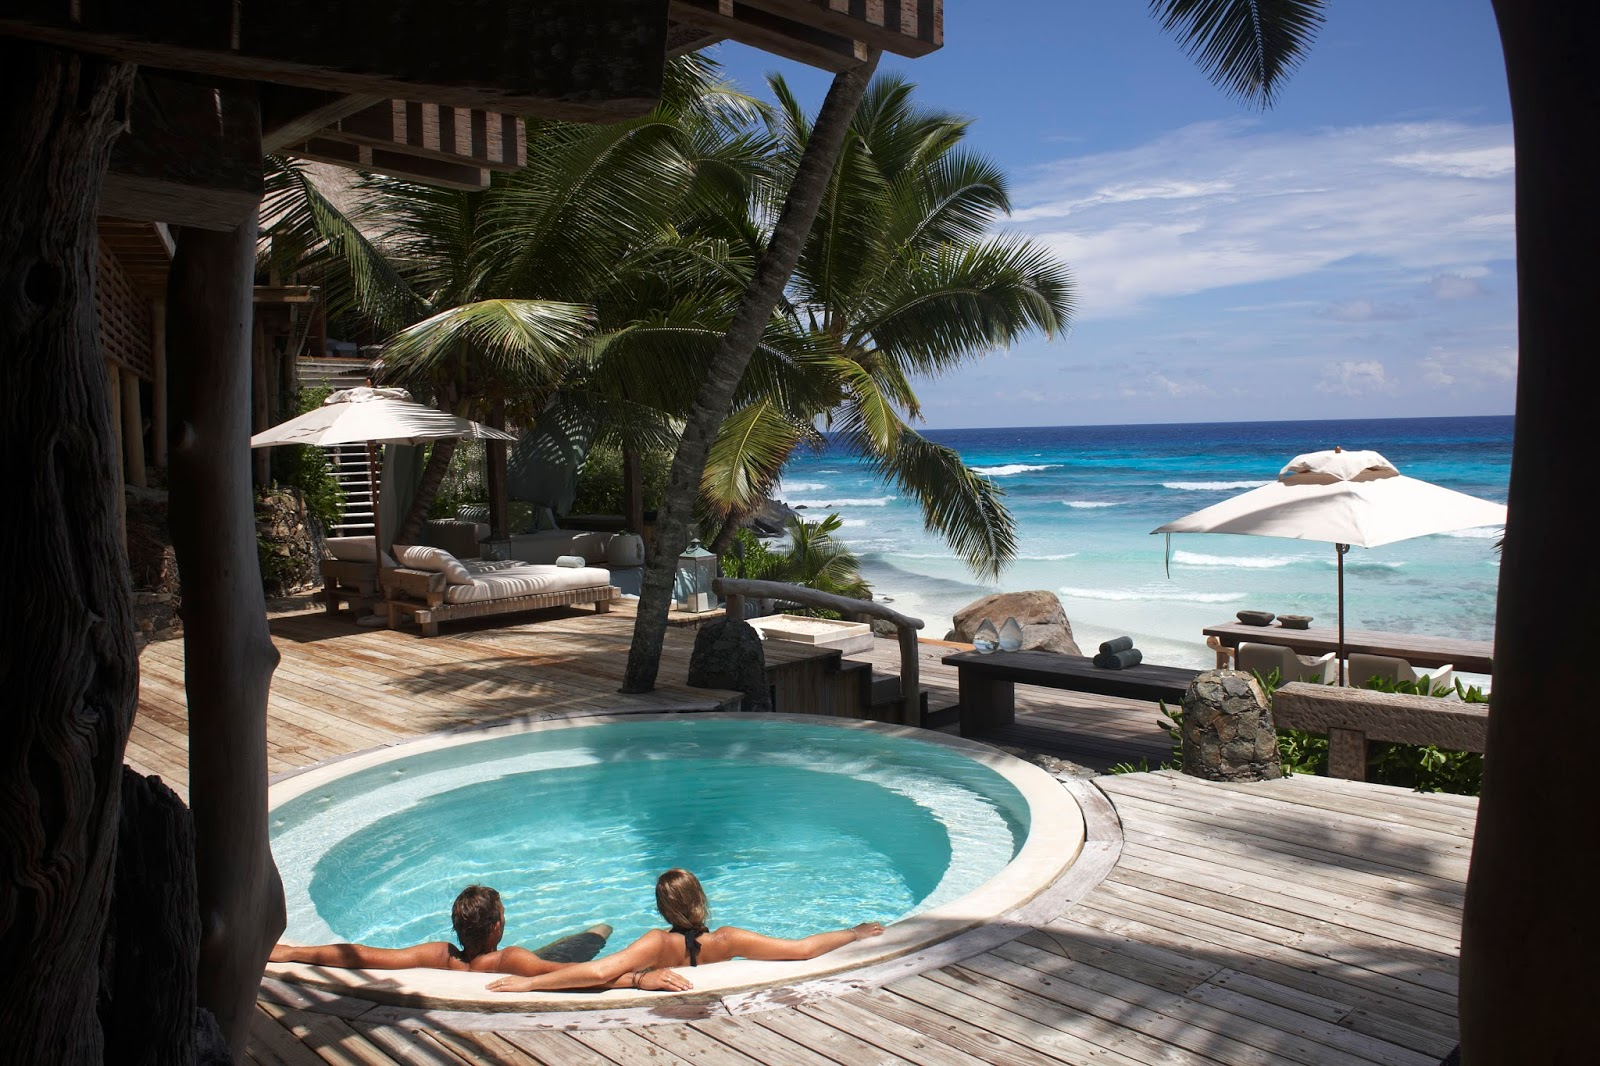 luxury life design seychelles sanctuary. Black Bedroom Furniture Sets. Home Design Ideas